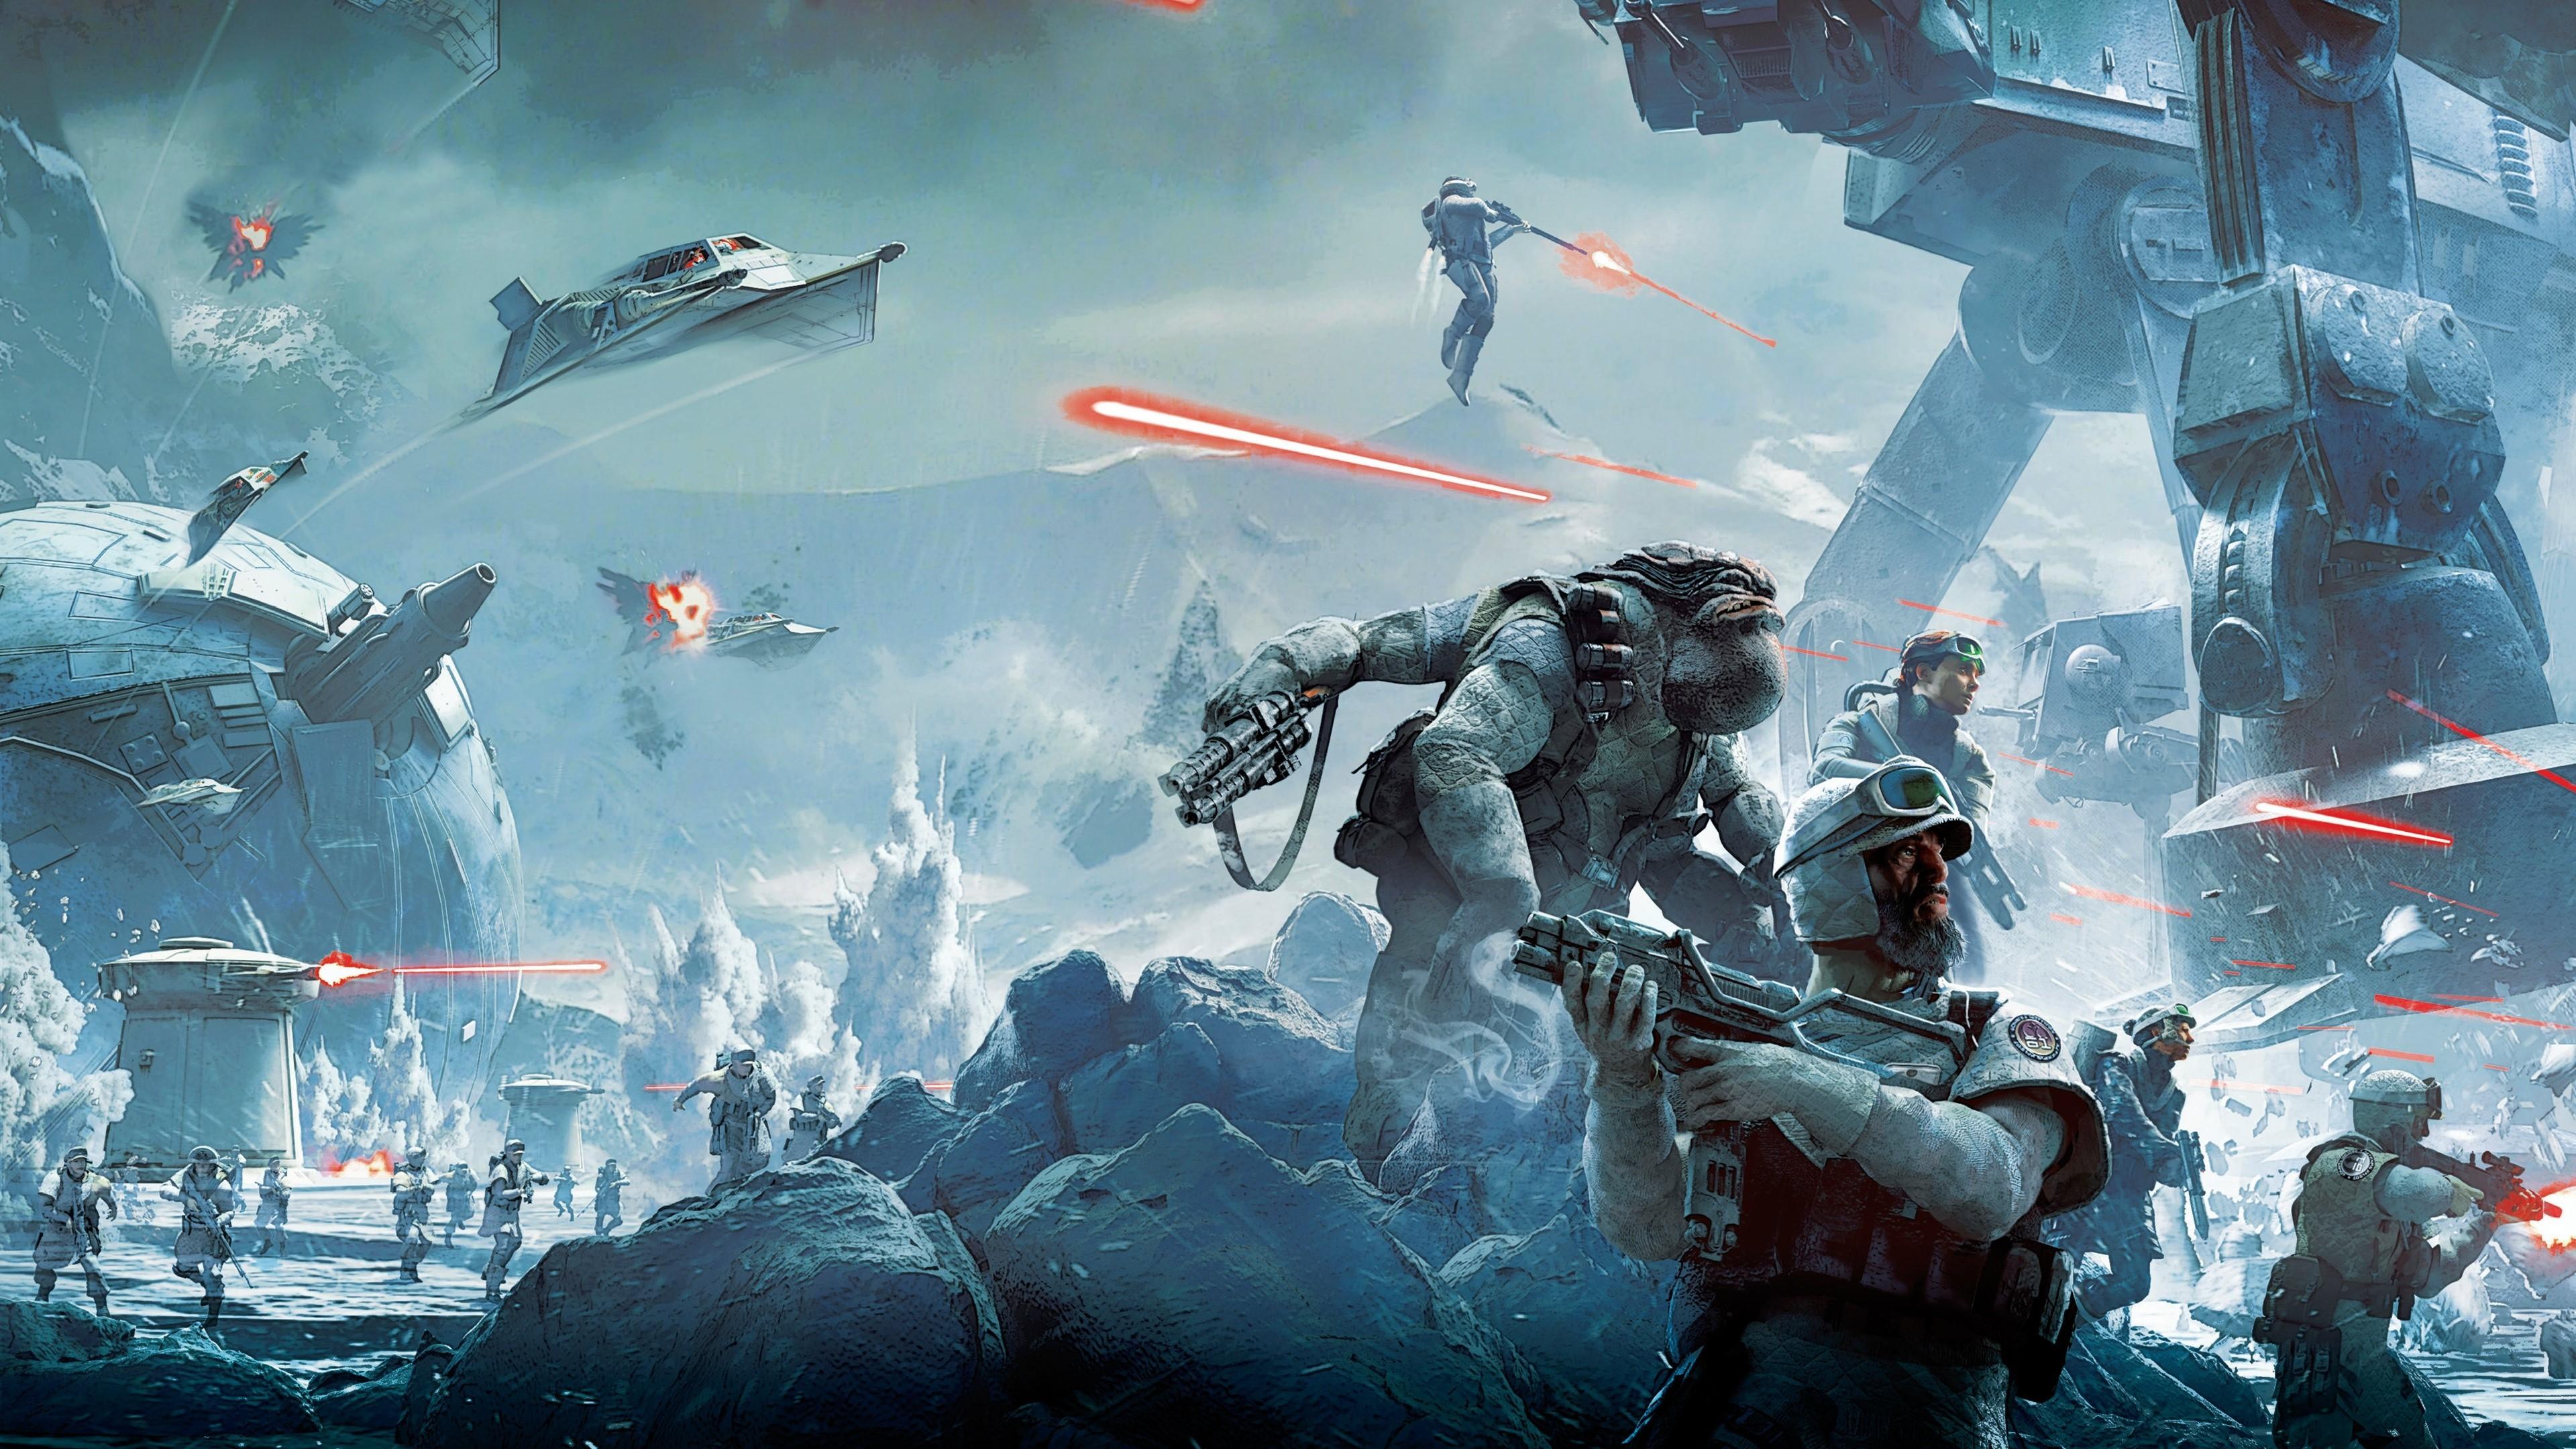 Cool Star Wars Wallpaper (79+ images)